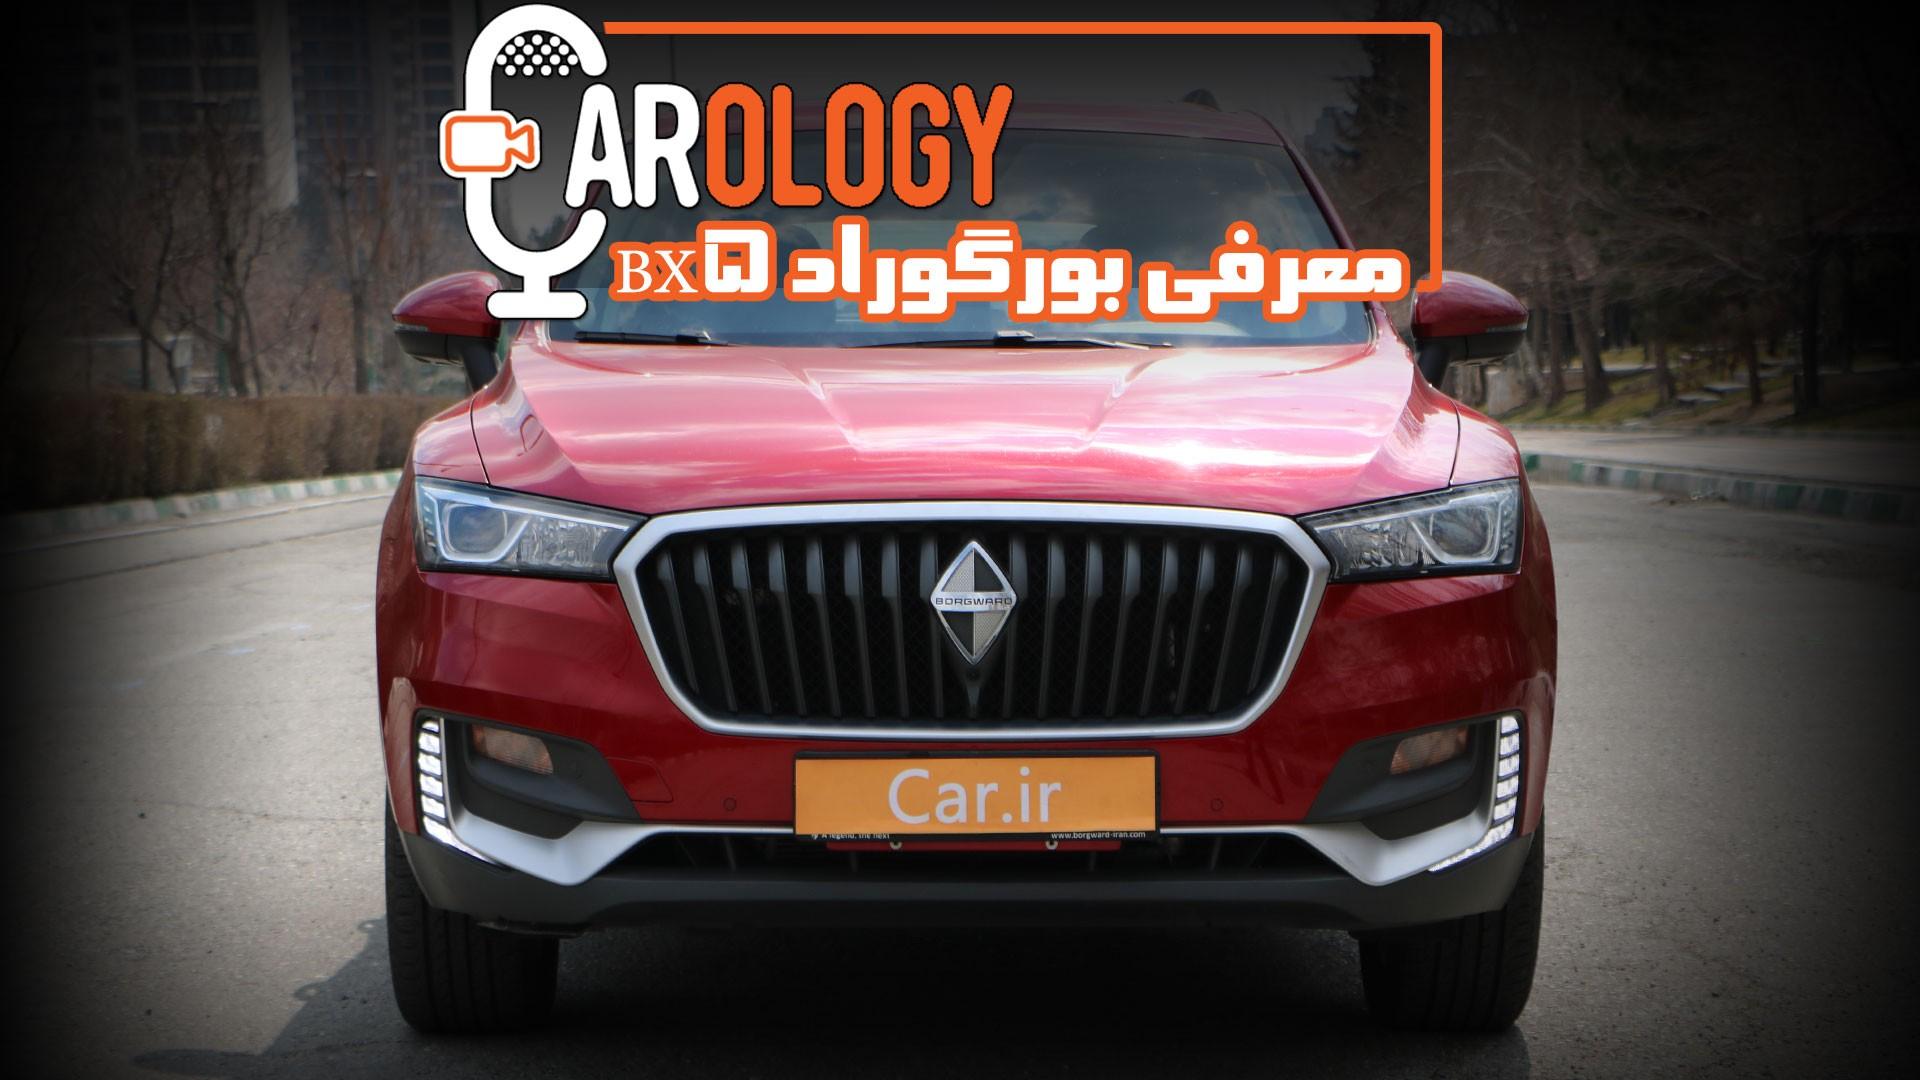 کارولوژی (13): معرفی بورگوارد BX5، جدیدترین محصول کیان موتور وارنا